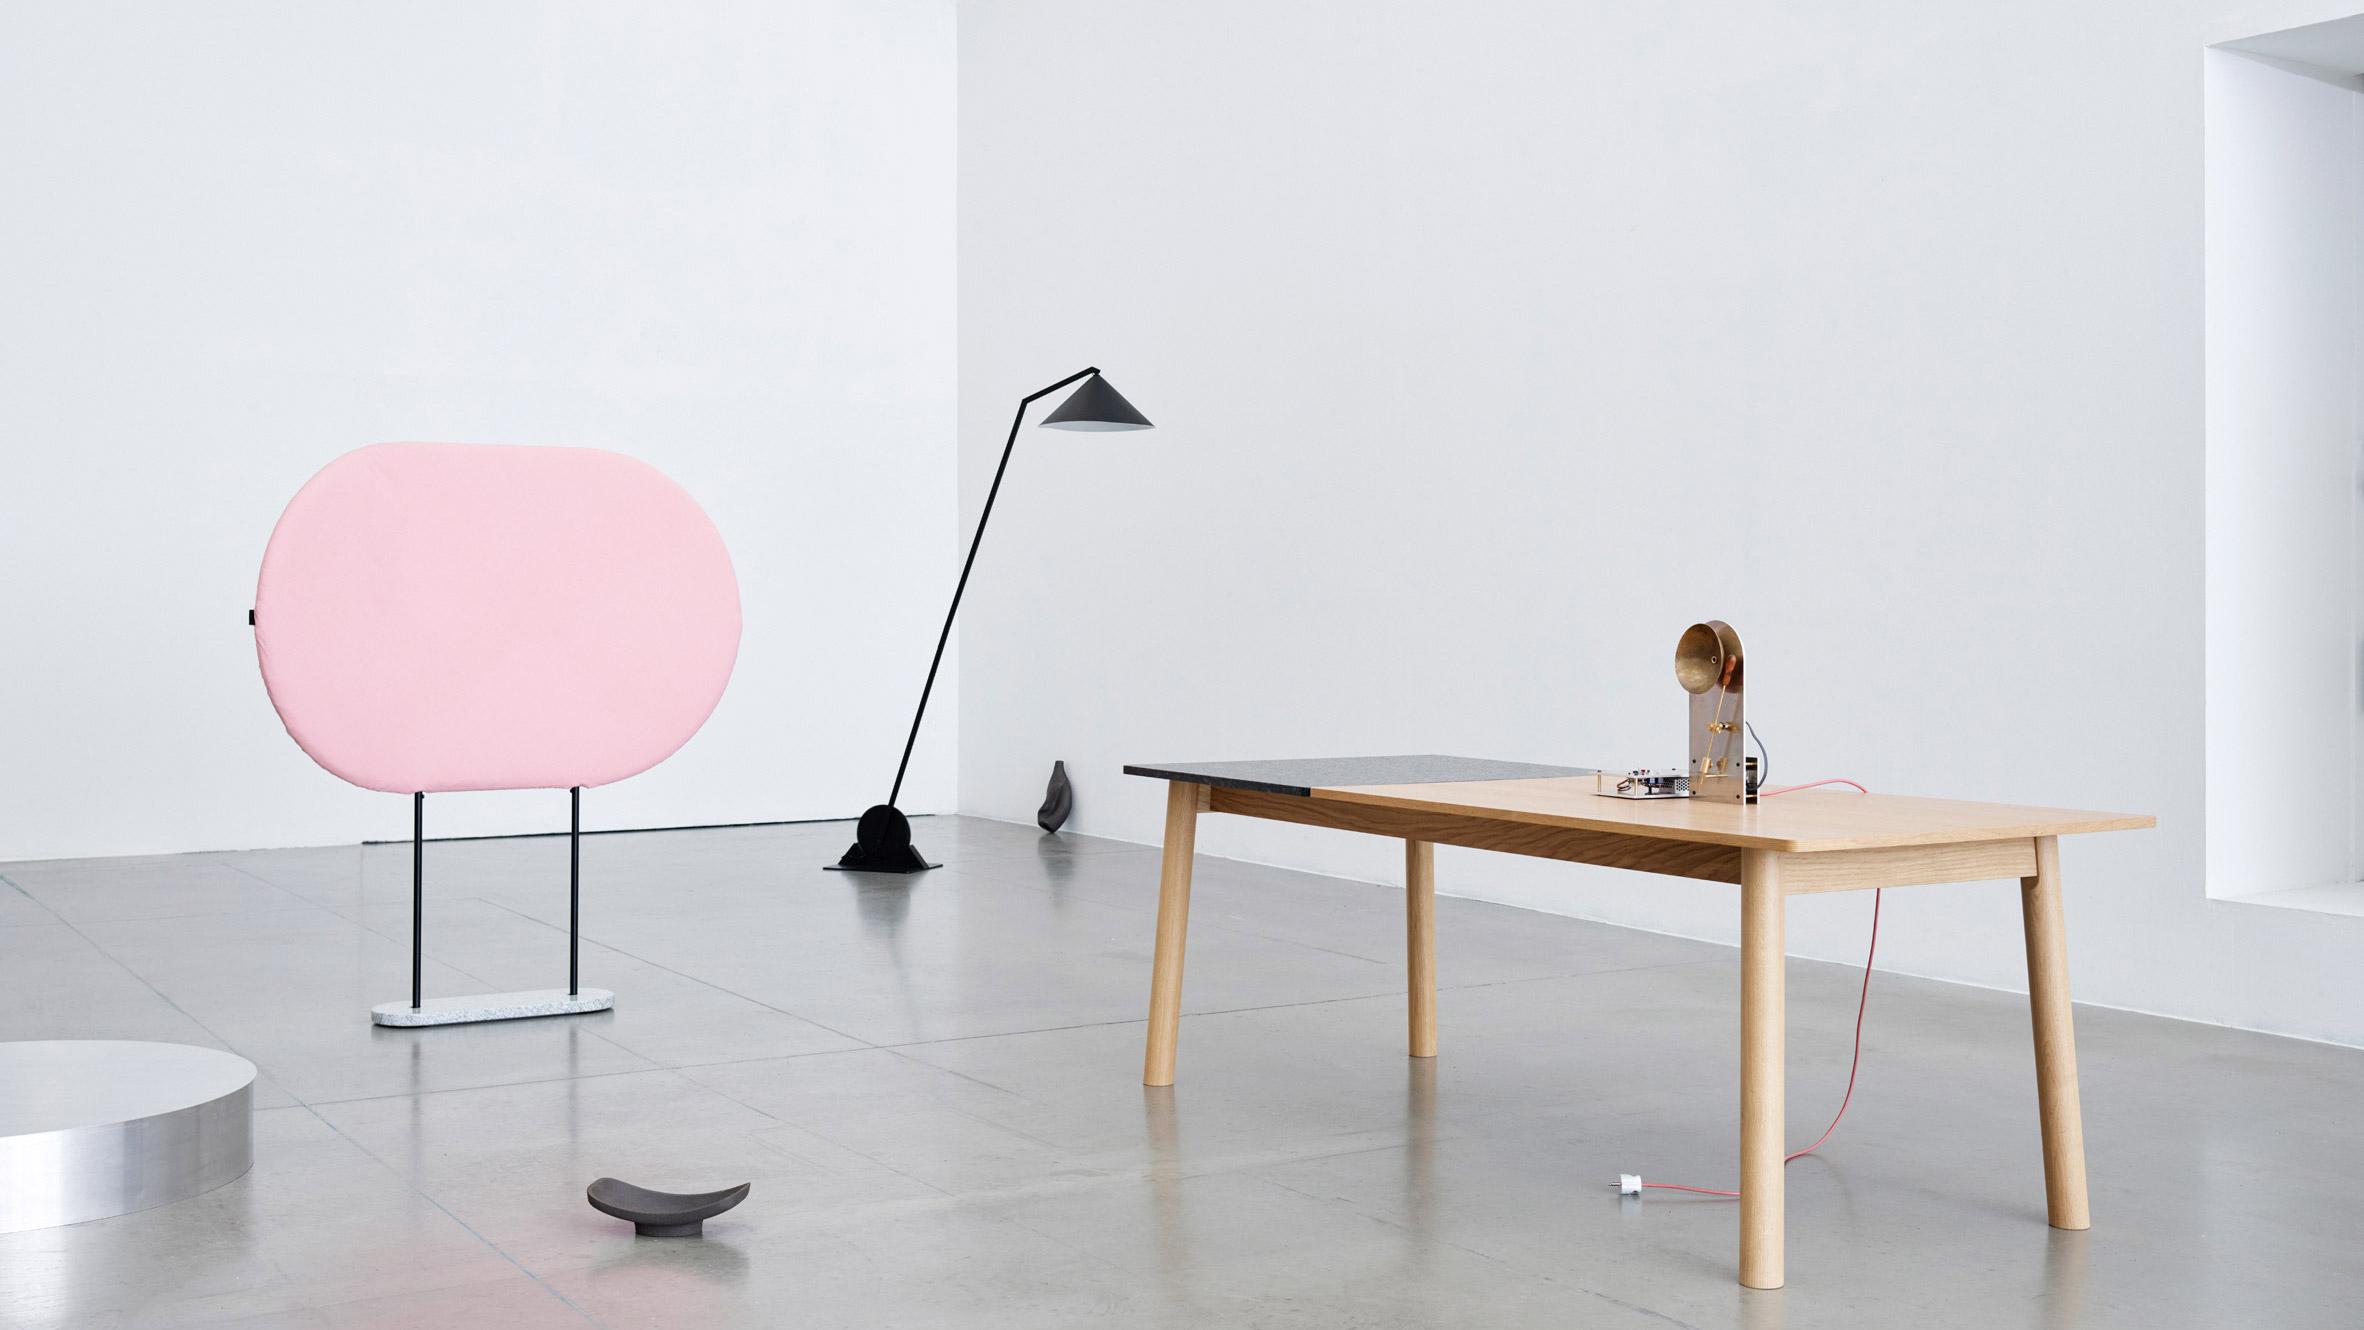 Norwegian Presence exhibition will explore